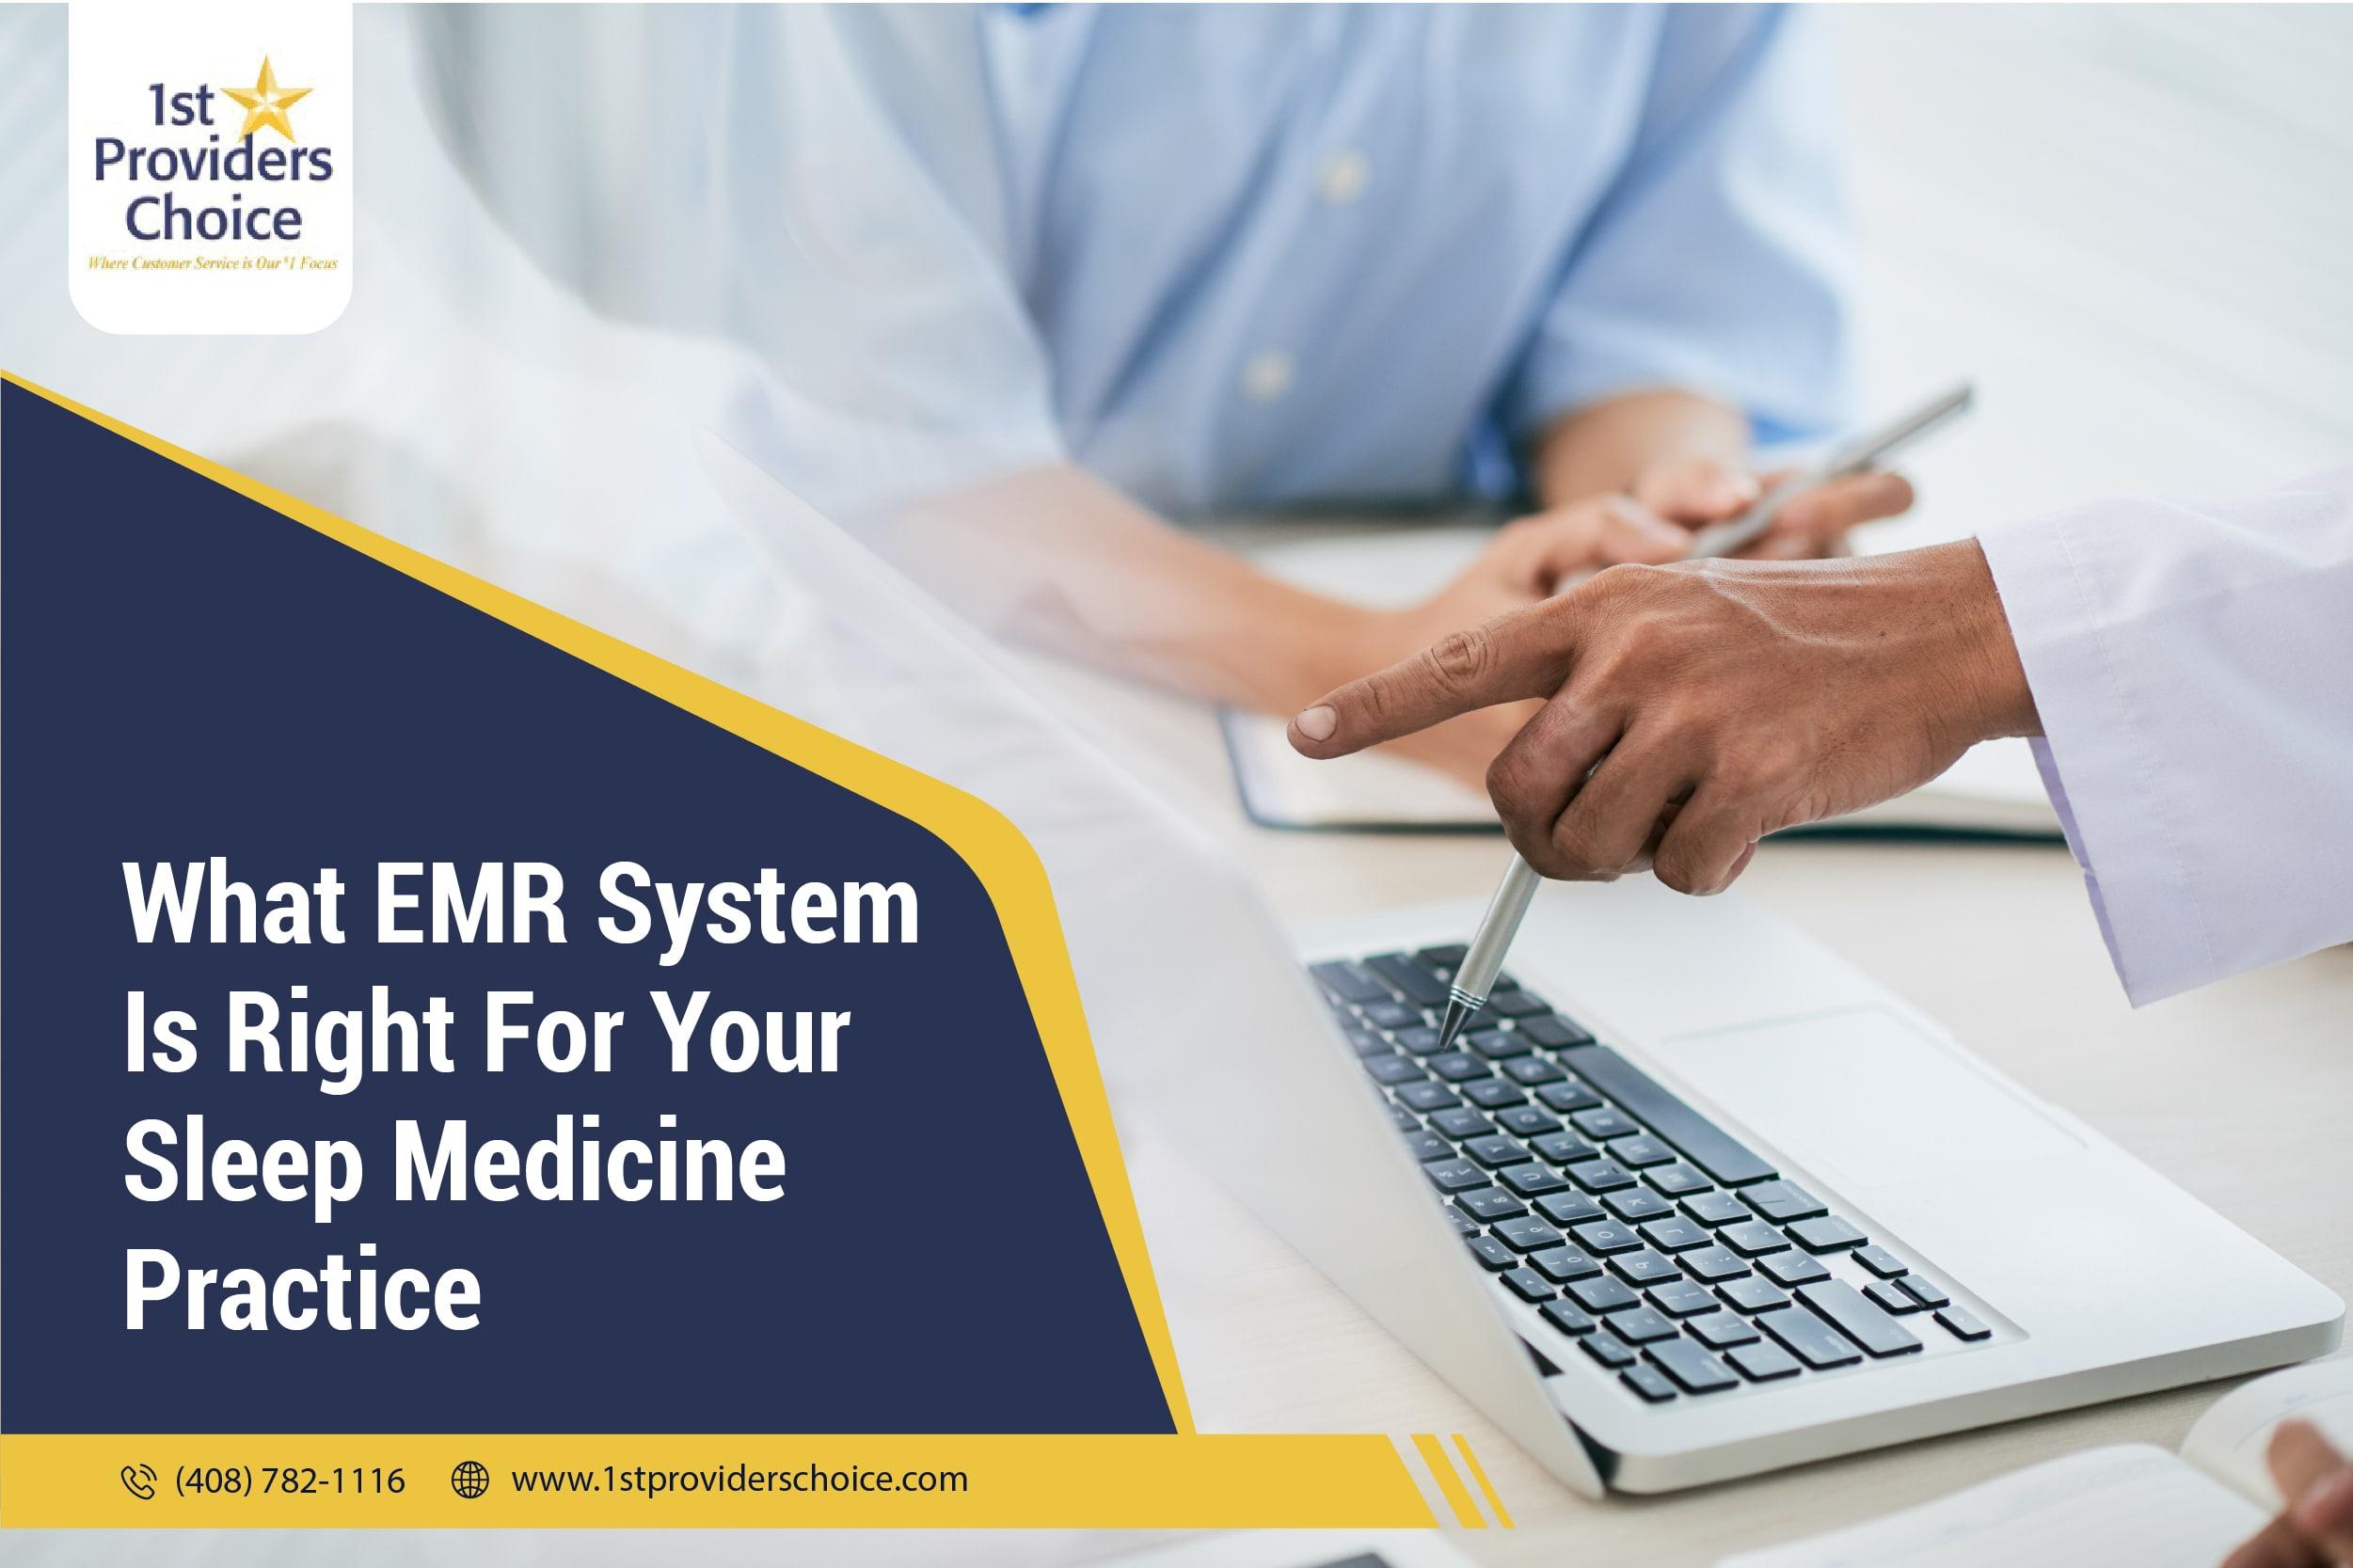 EMR Sleep Medicine